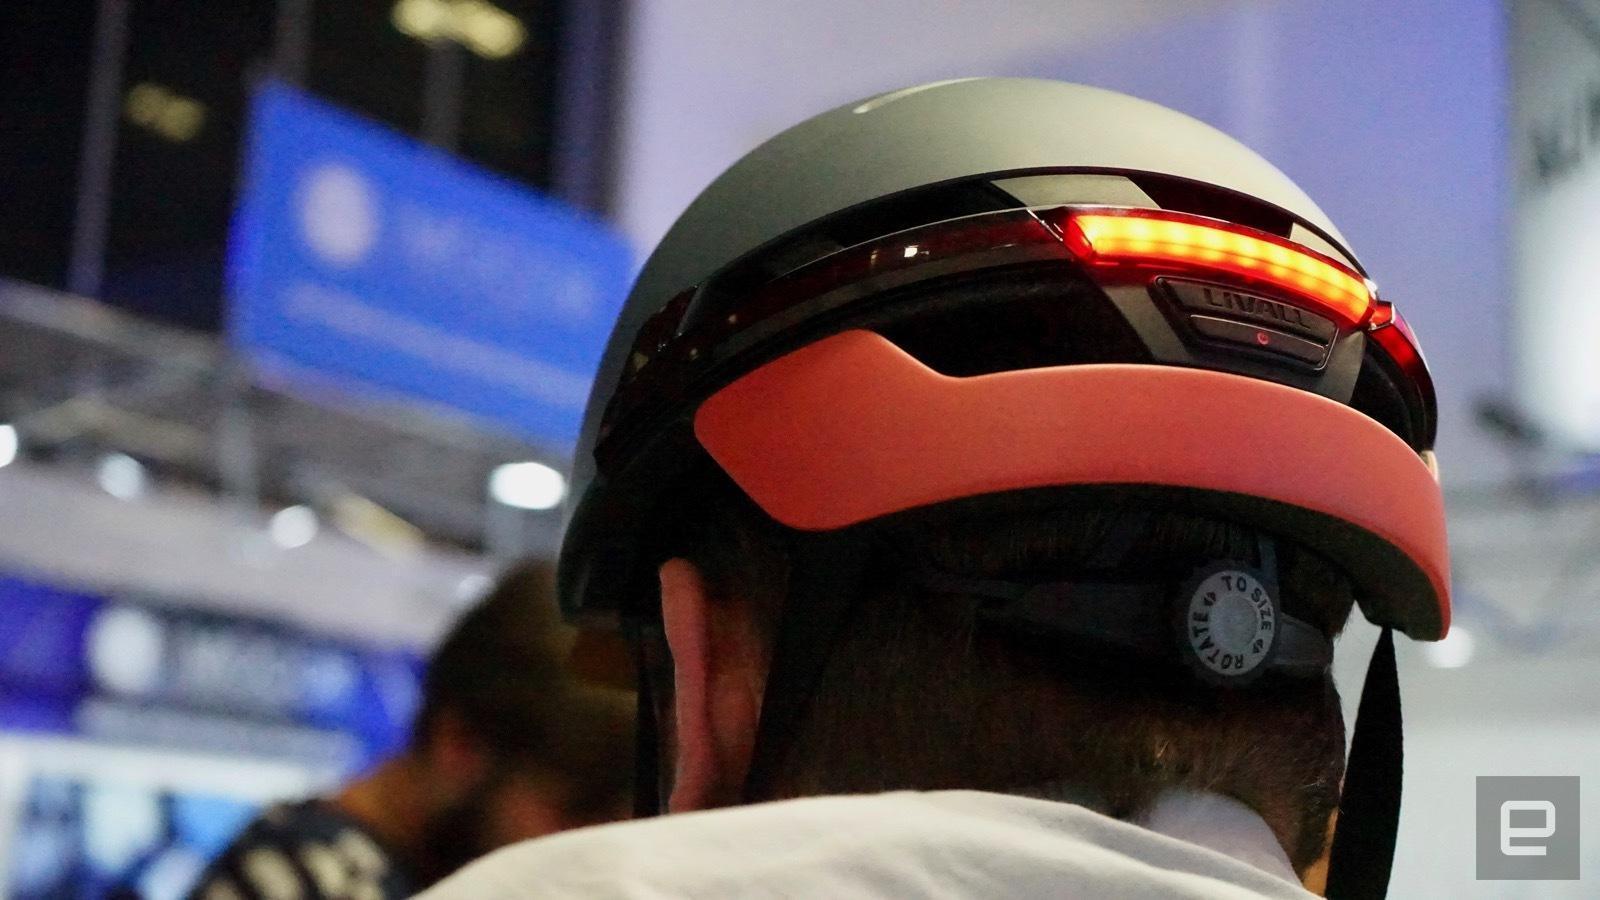 Шлем Livell IFA 2017. Livell показала велошлем в стиле Робокопа